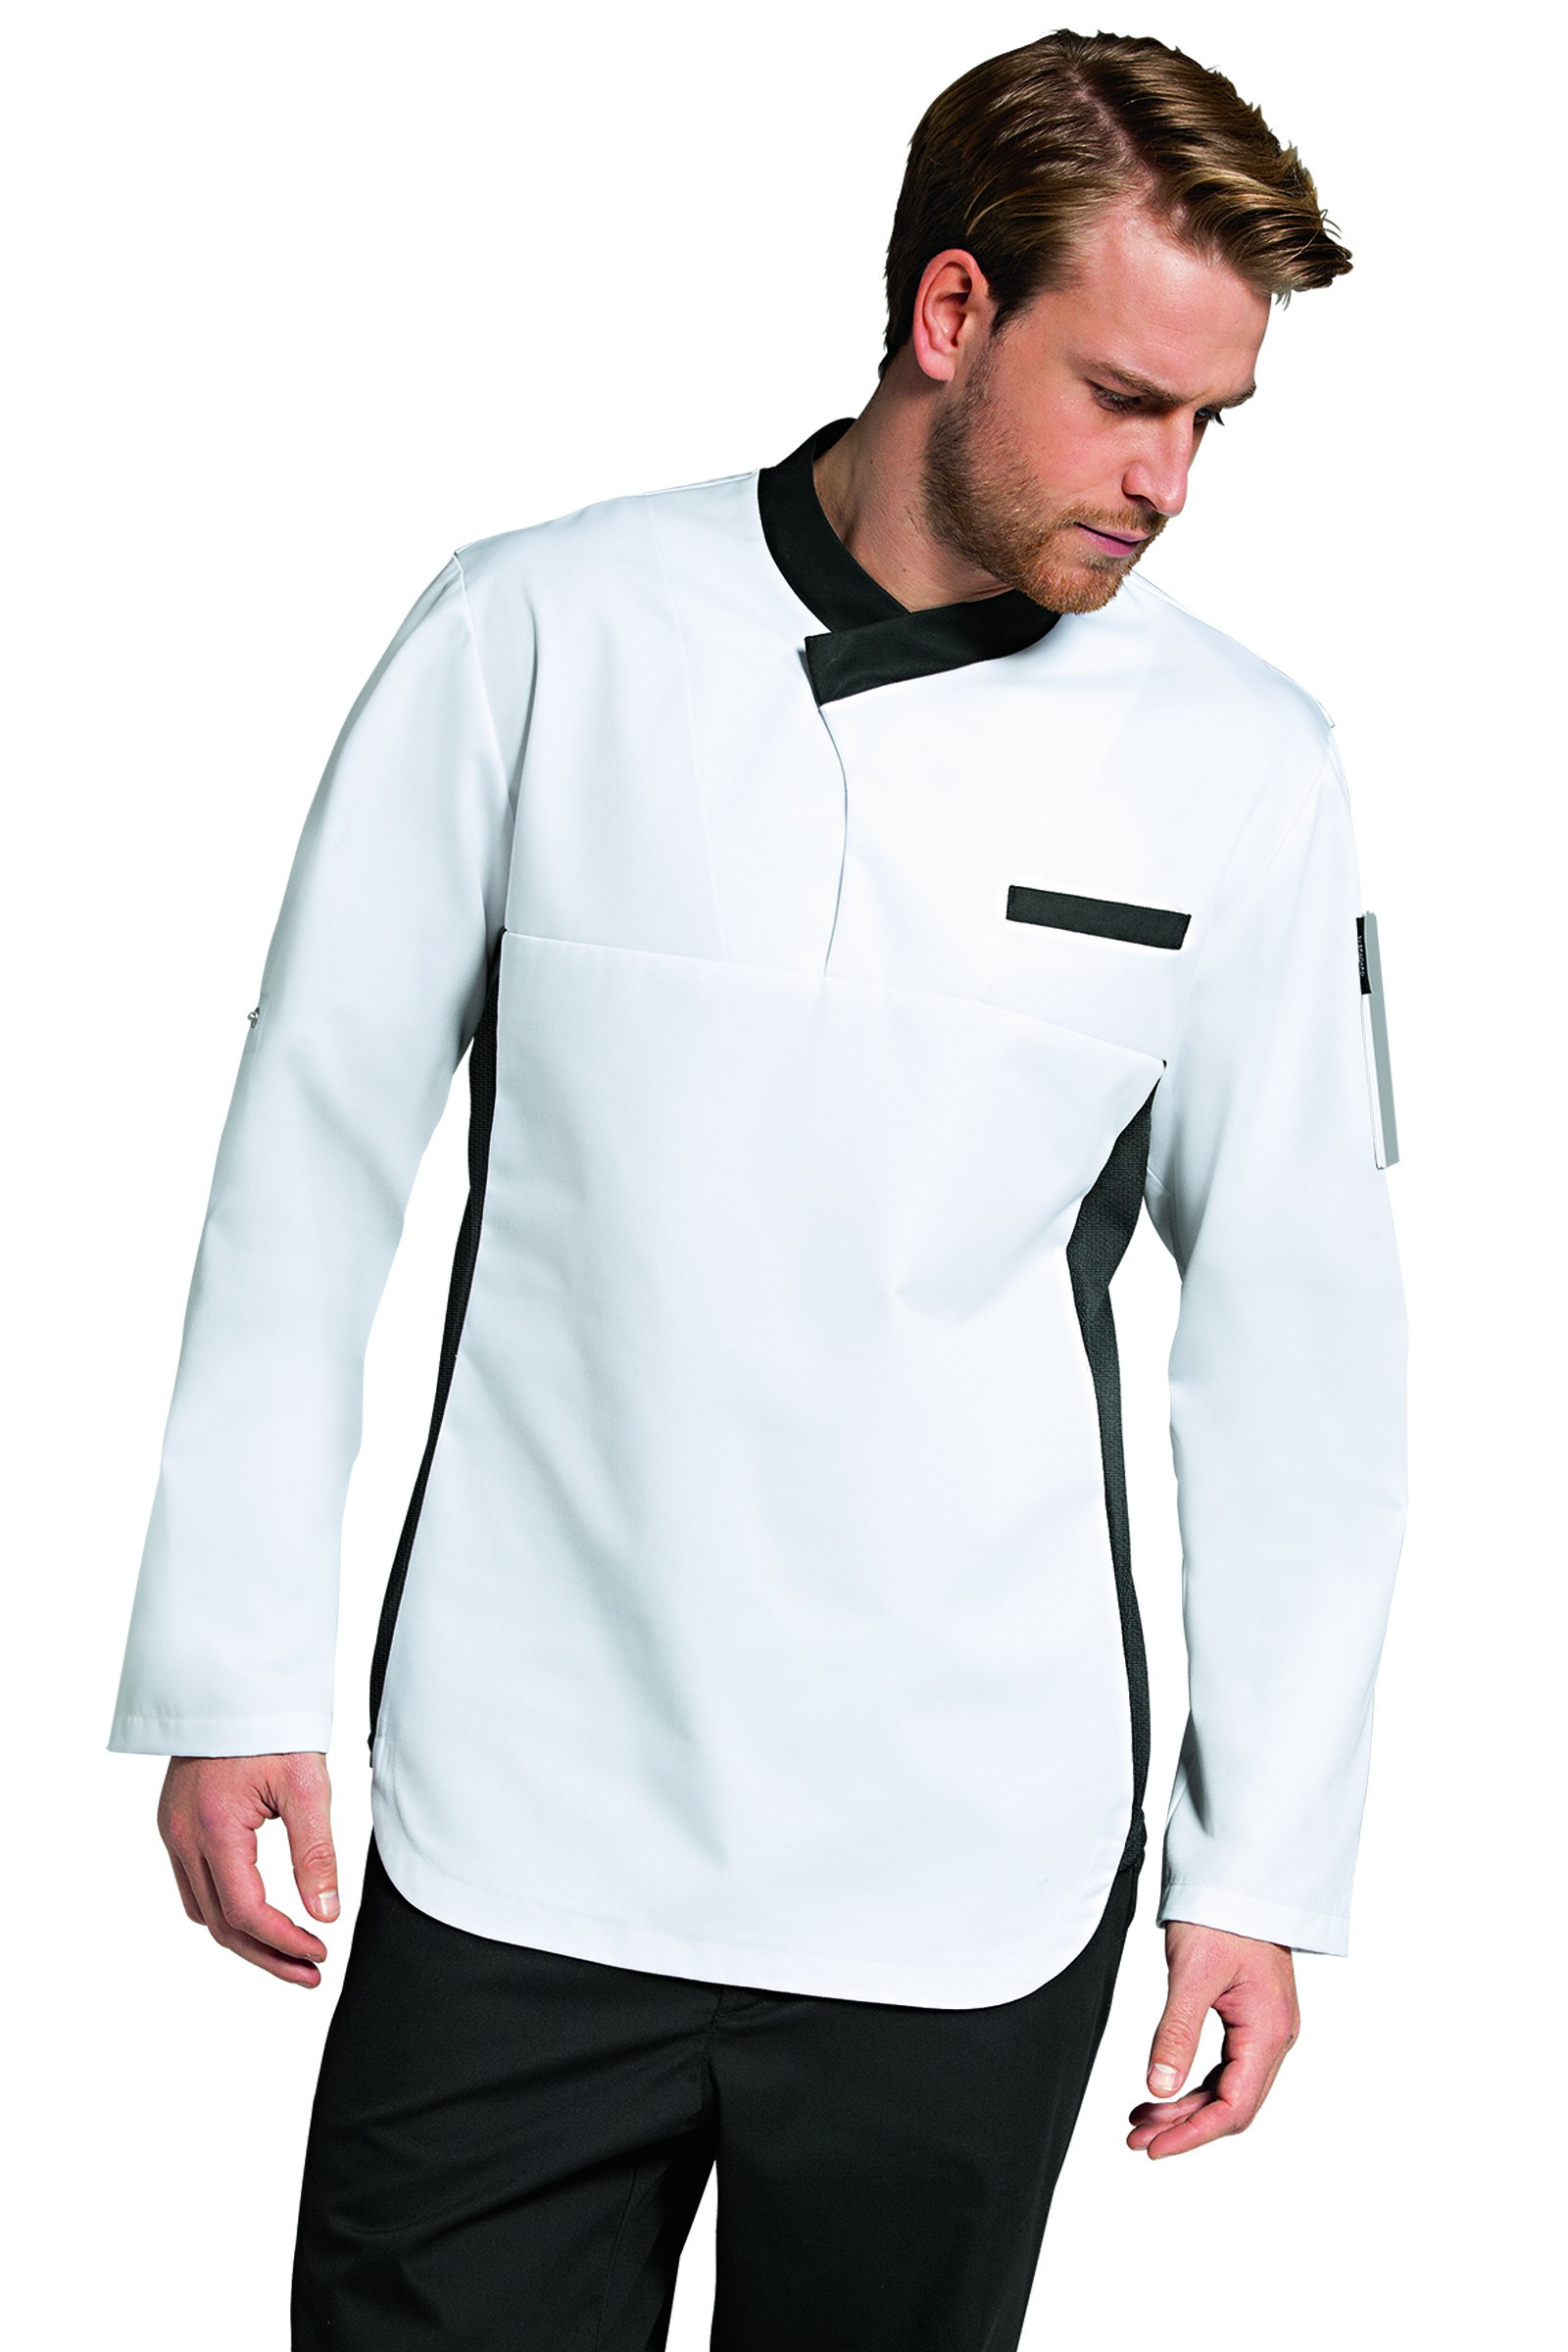 Veste bleu blanc rouge femme coupes vent nike windrunner blanc rouge marine homme vestes 2856364 lrg Veste de cuisine orange